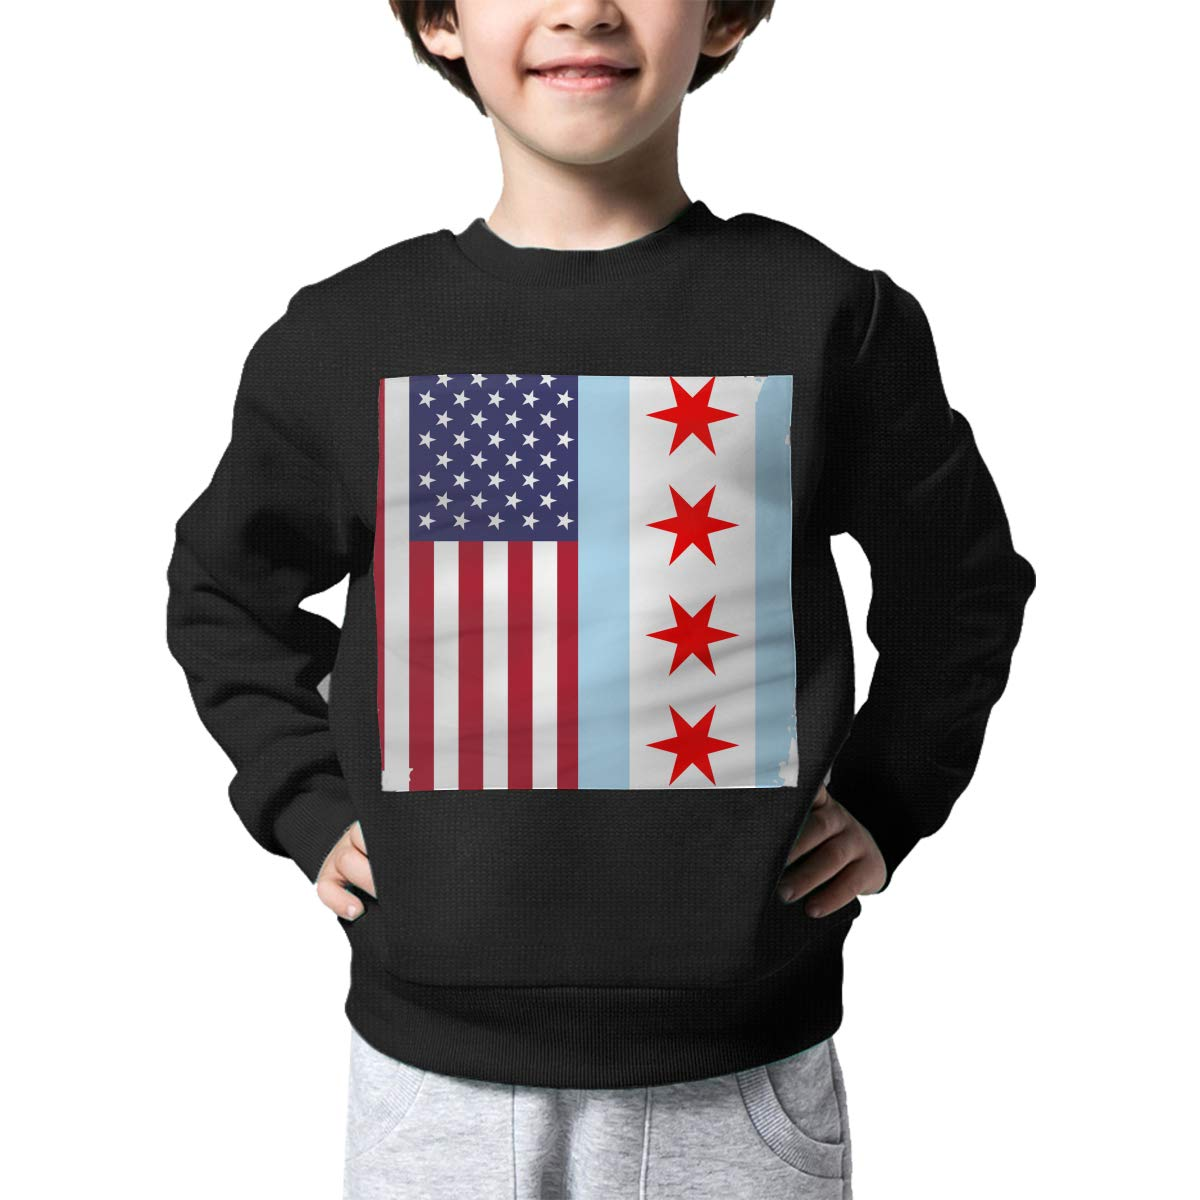 NJKM5MJ Boys Girls American Chicago Flag Lovely Sweaters Soft Warm Kids Sweater